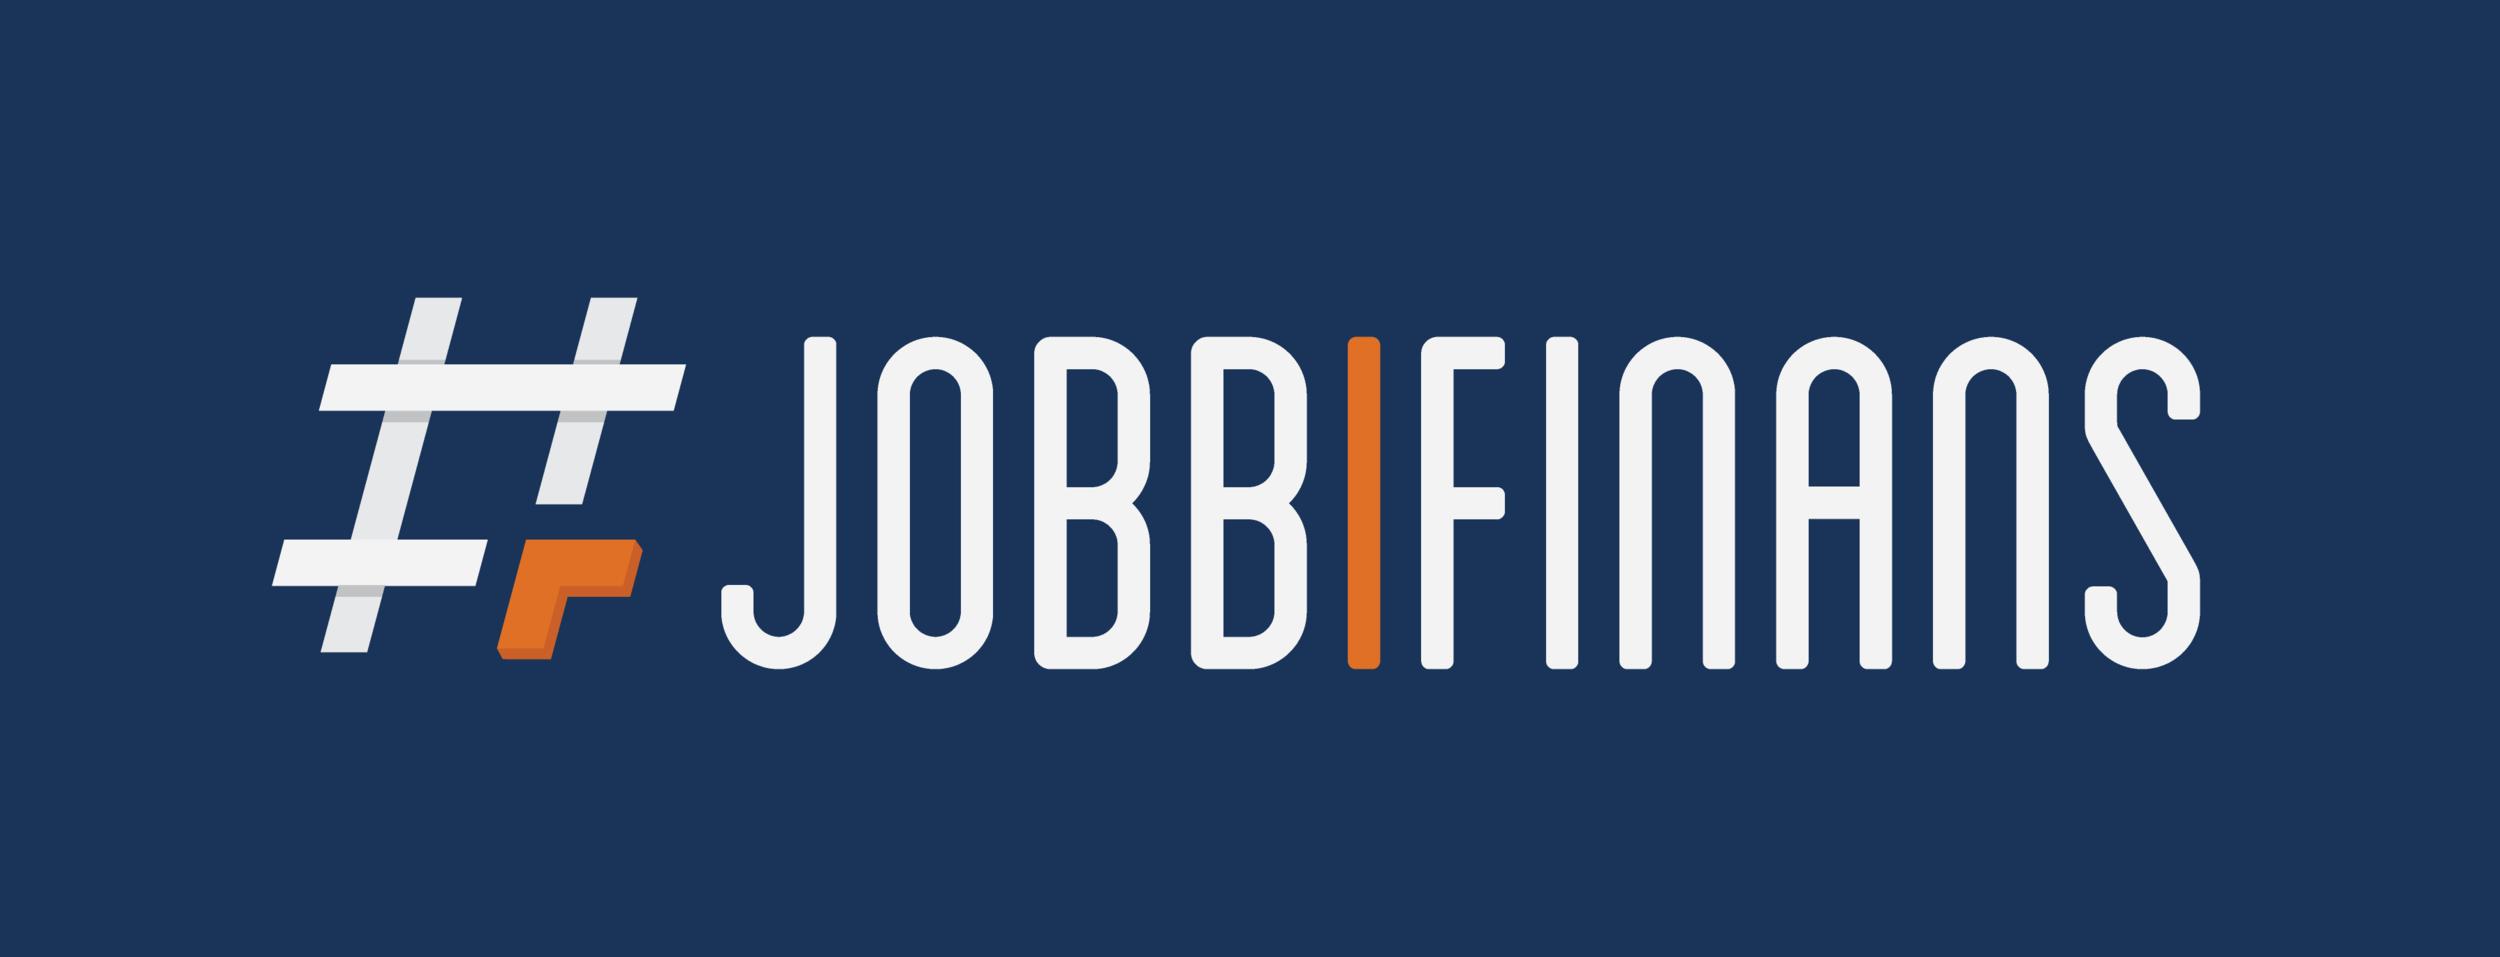 Jobbifinans-Konsus-FINAL-Large-Negative 01.png